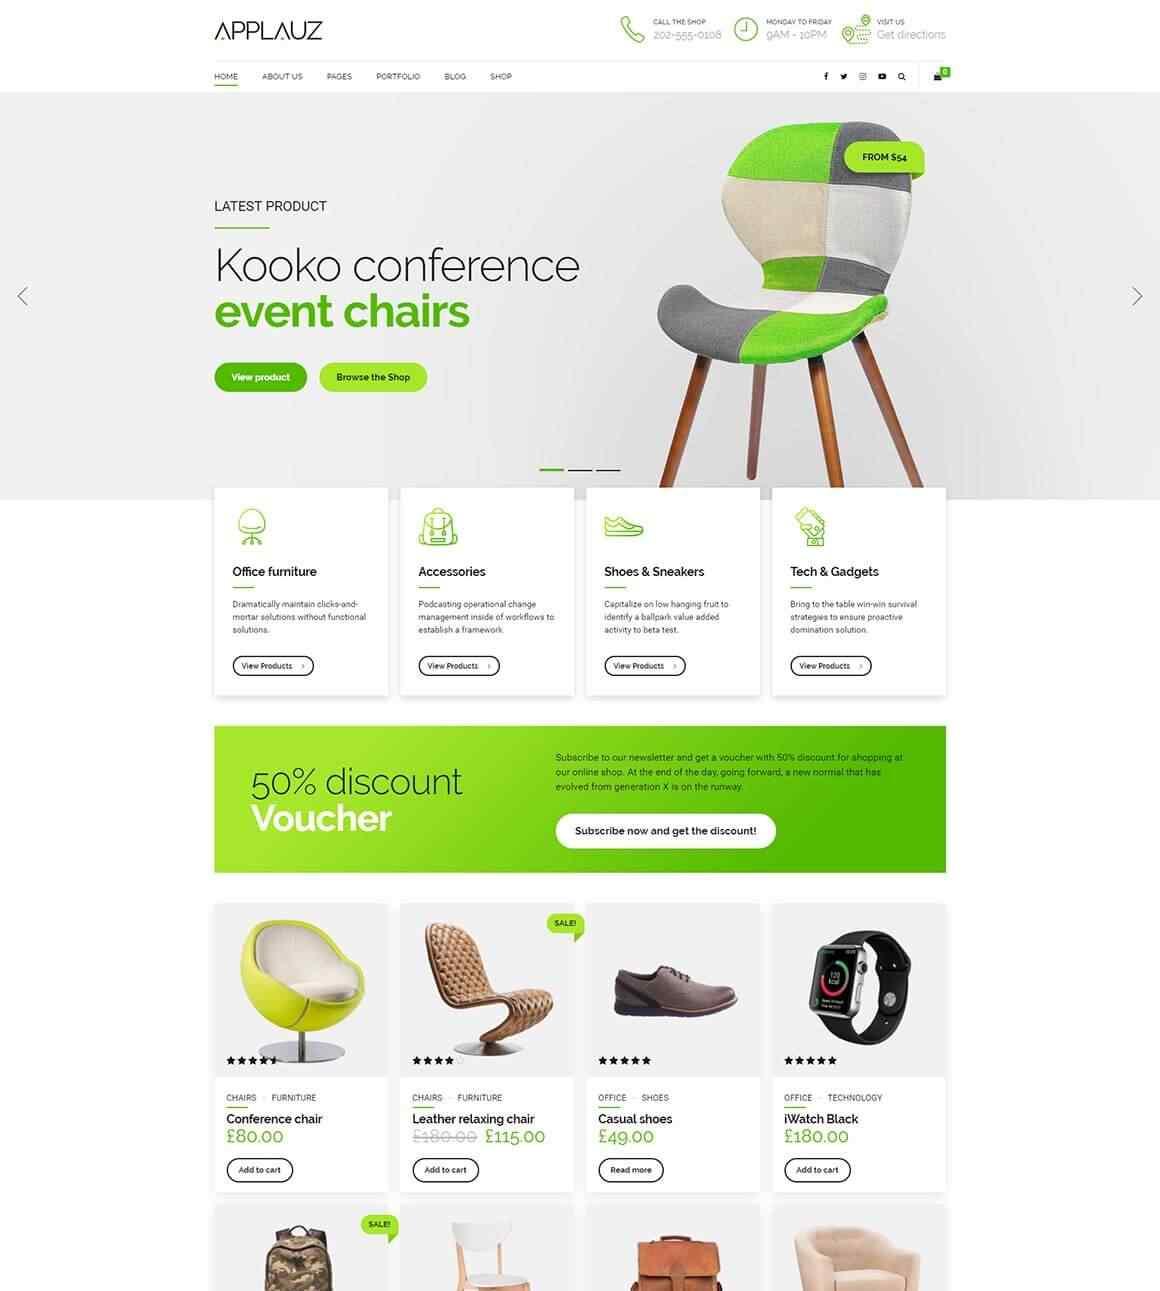 https://www.comdatec.com/wp-content/uploads/2017/11/Screenshot-Shop.jpg